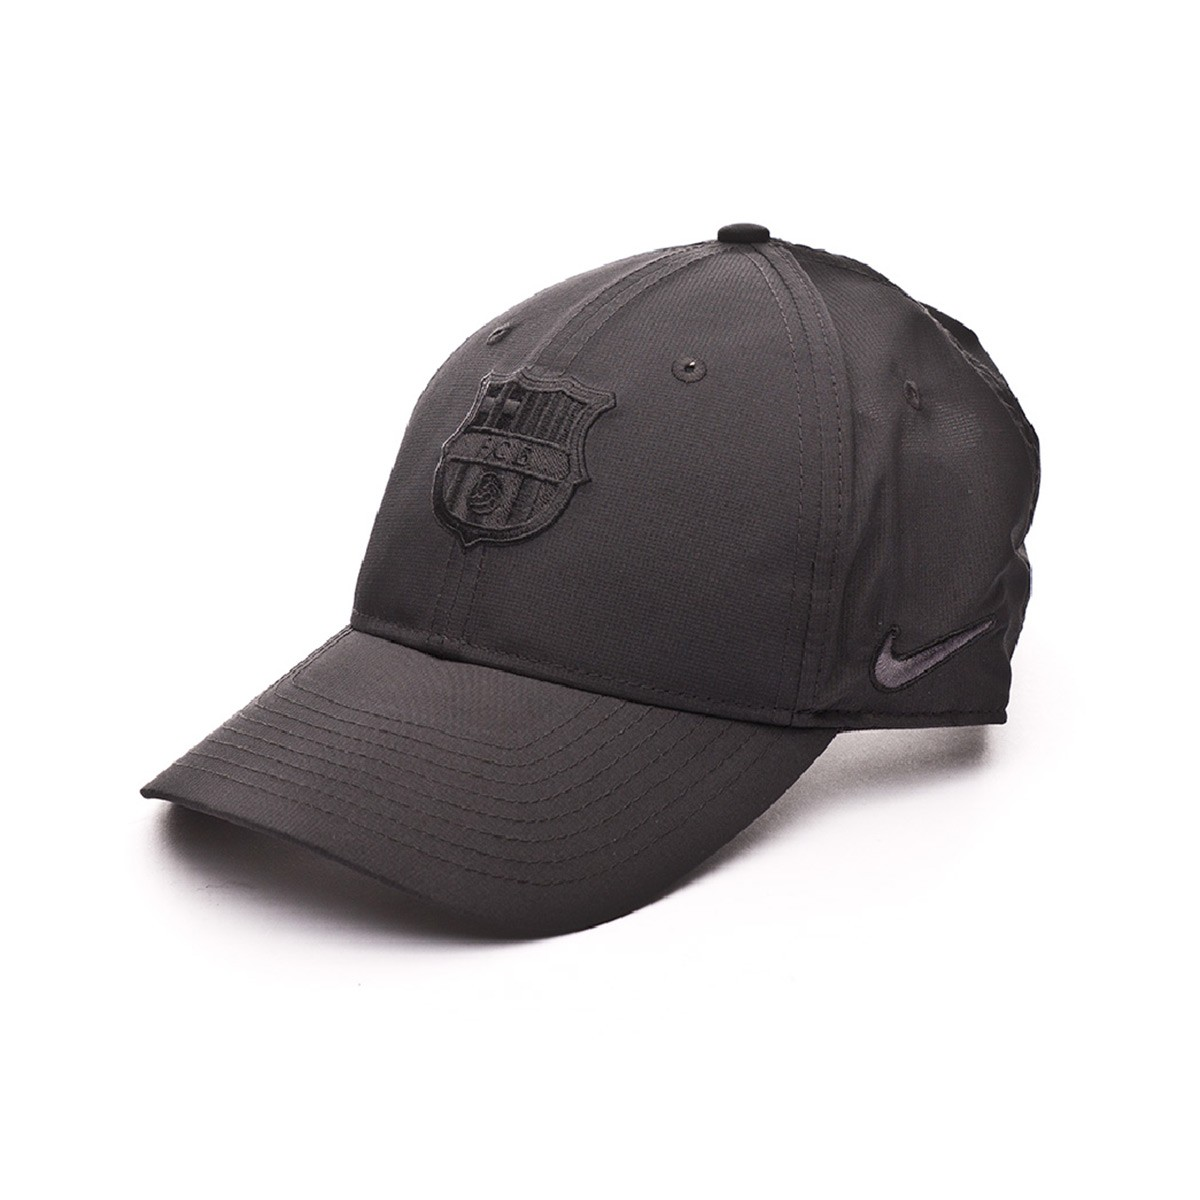 74b4616a8824f Cap Nike FC Barcelona Dry L91 2018-2019 Black - Football store Fútbol  Emotion